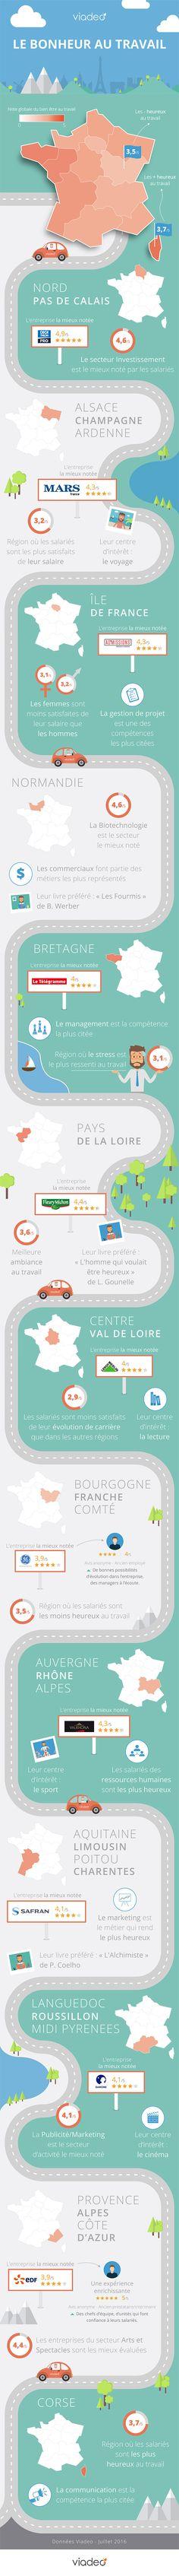 http://www.usine-digitale.fr/article/bonheur-au-travail-viadeo-sort-ses-chiffres.N403702